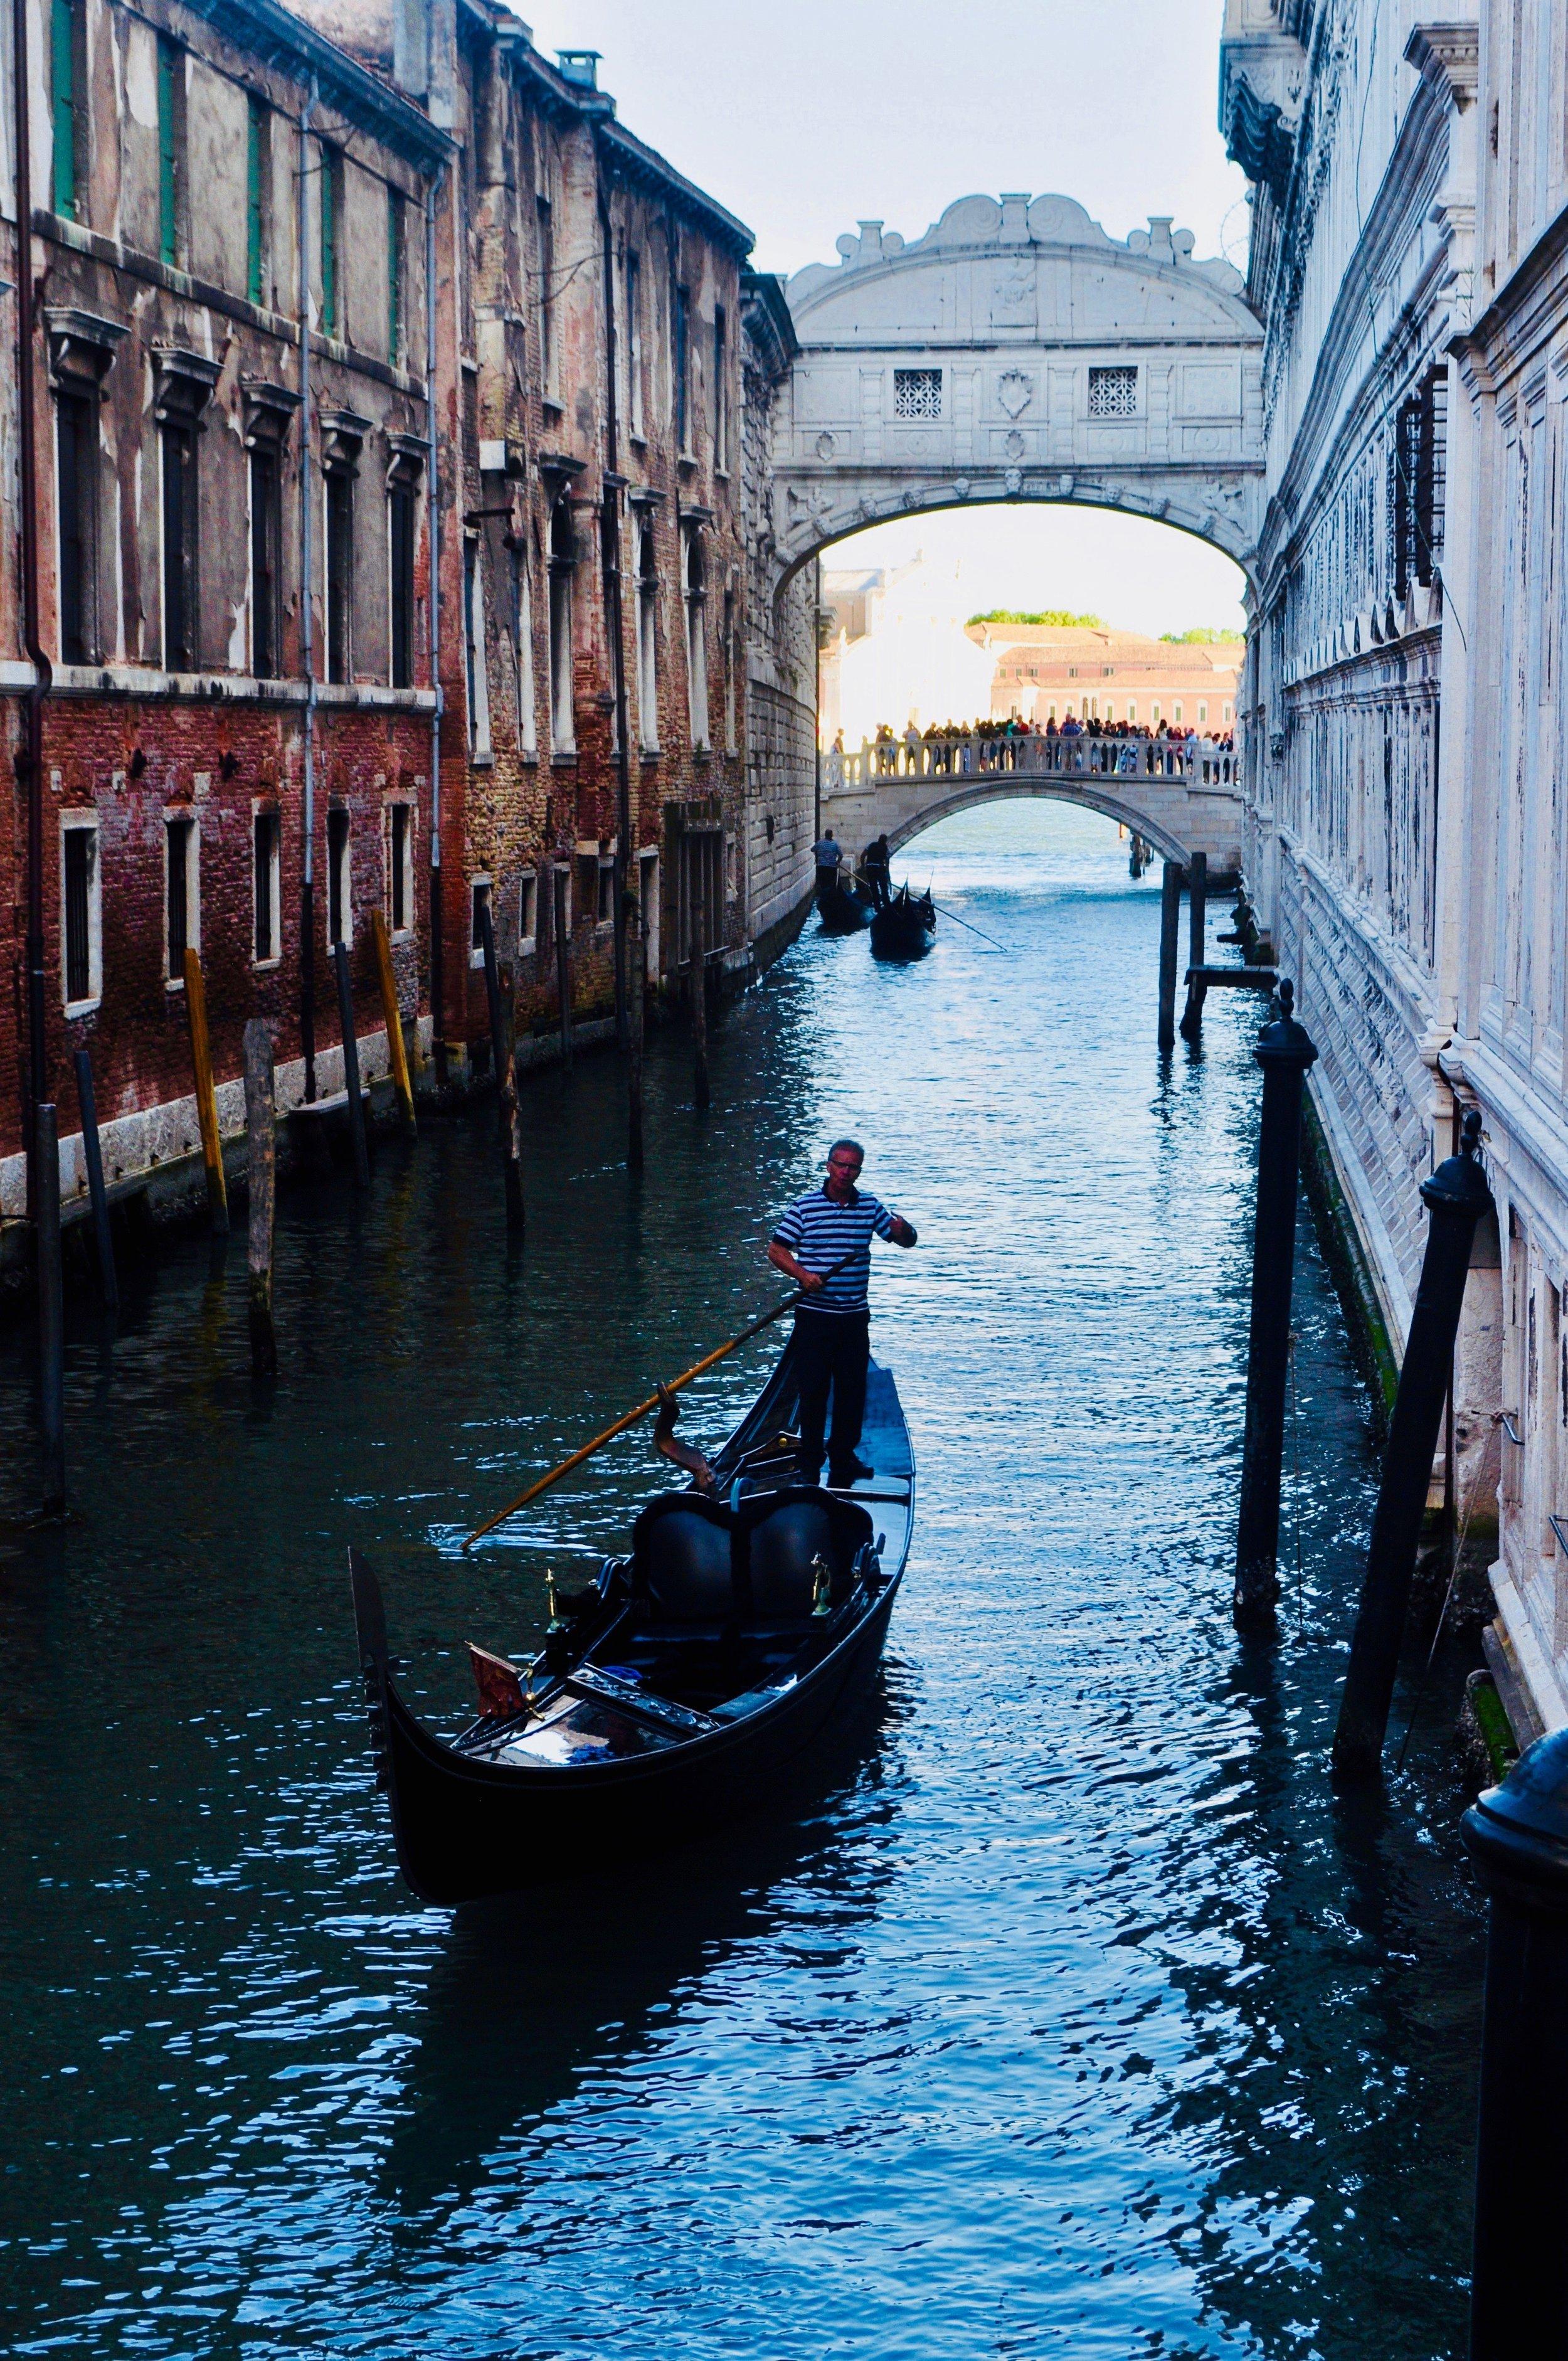 Gondola Ride under the Bridge of Sighs